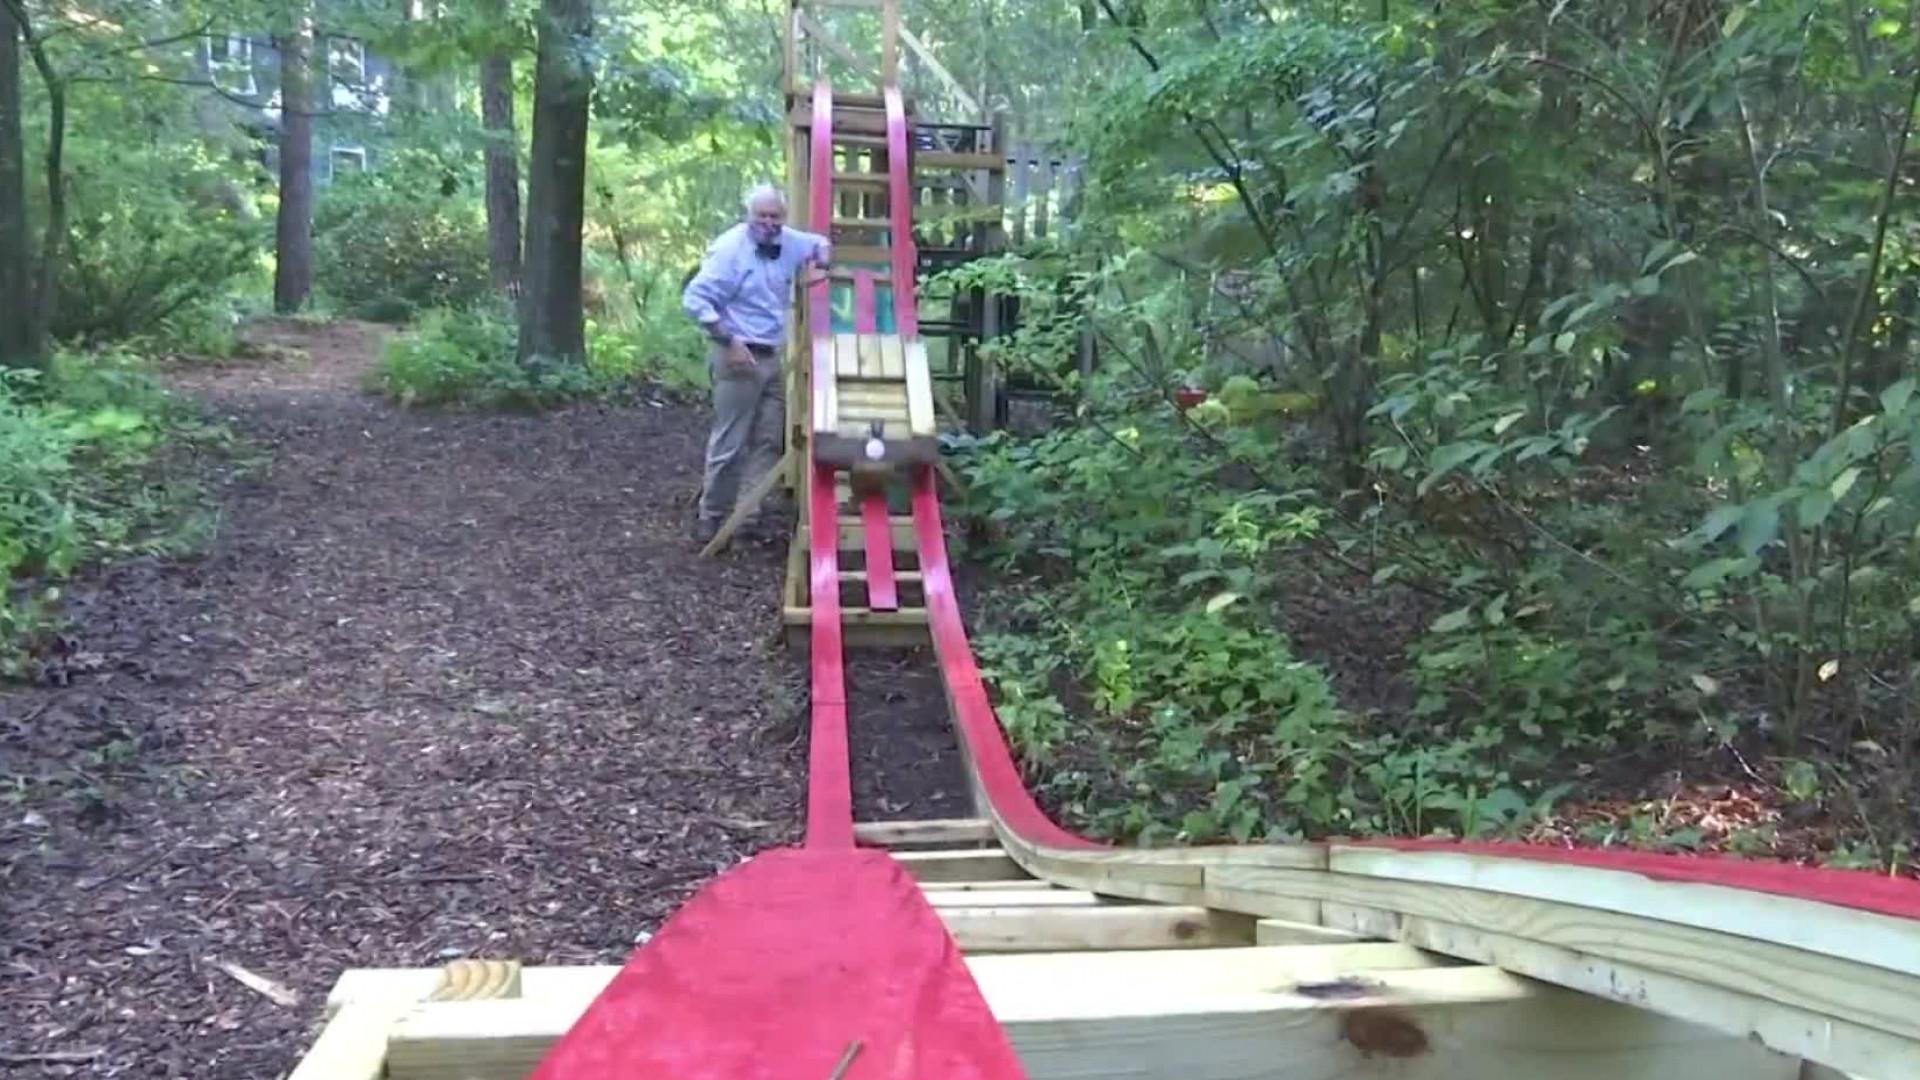 A grandfather and grandson build a roller coaster in their Rhode Island backyard (WJAR Photo)